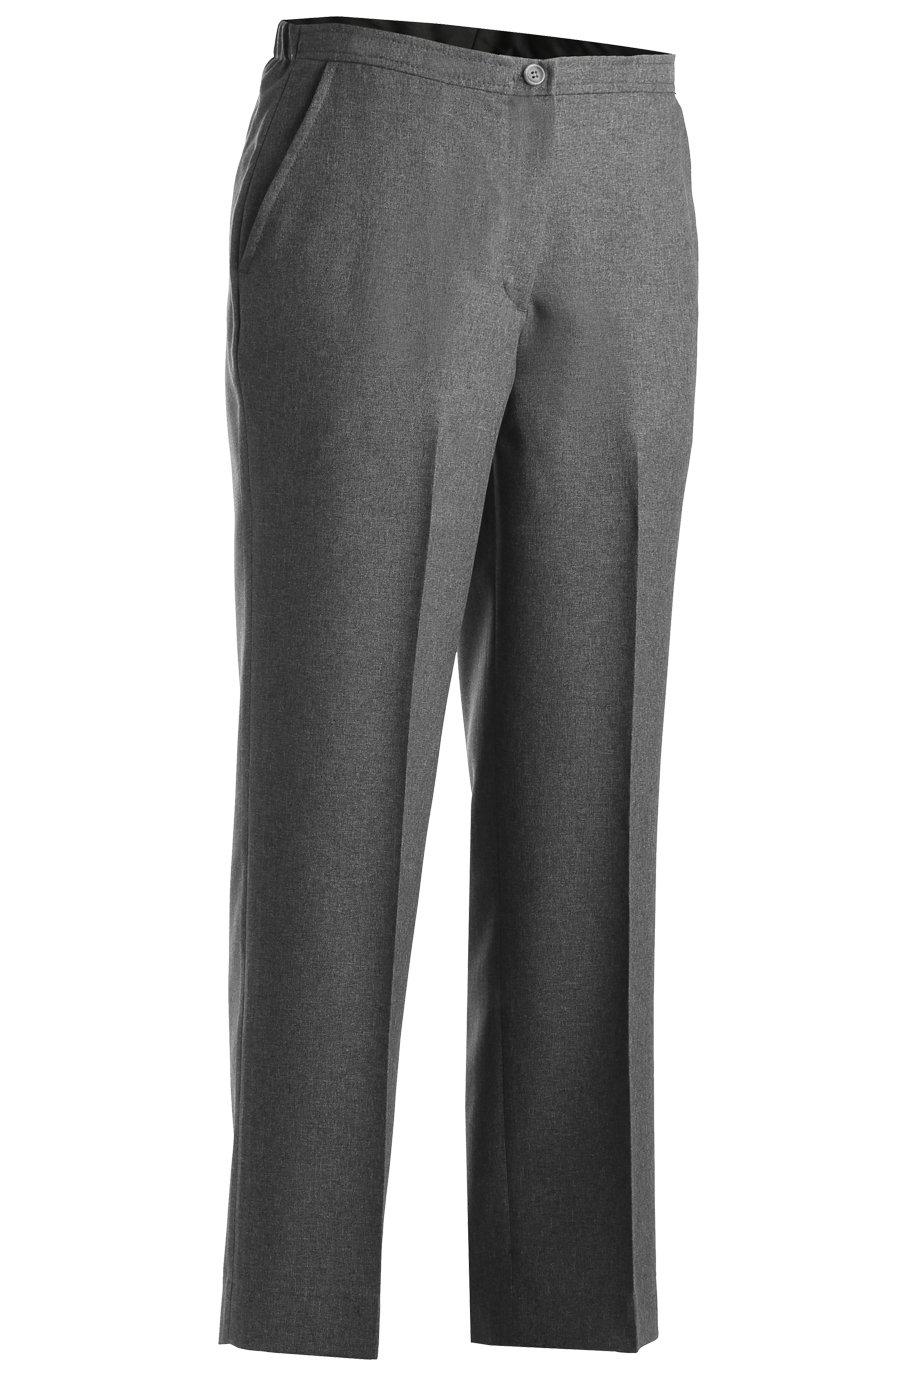 Edwards Garmentレディースパフォーマンスフラットフロントパンツ B07BTHYMFT 28W グレー グレー 28W